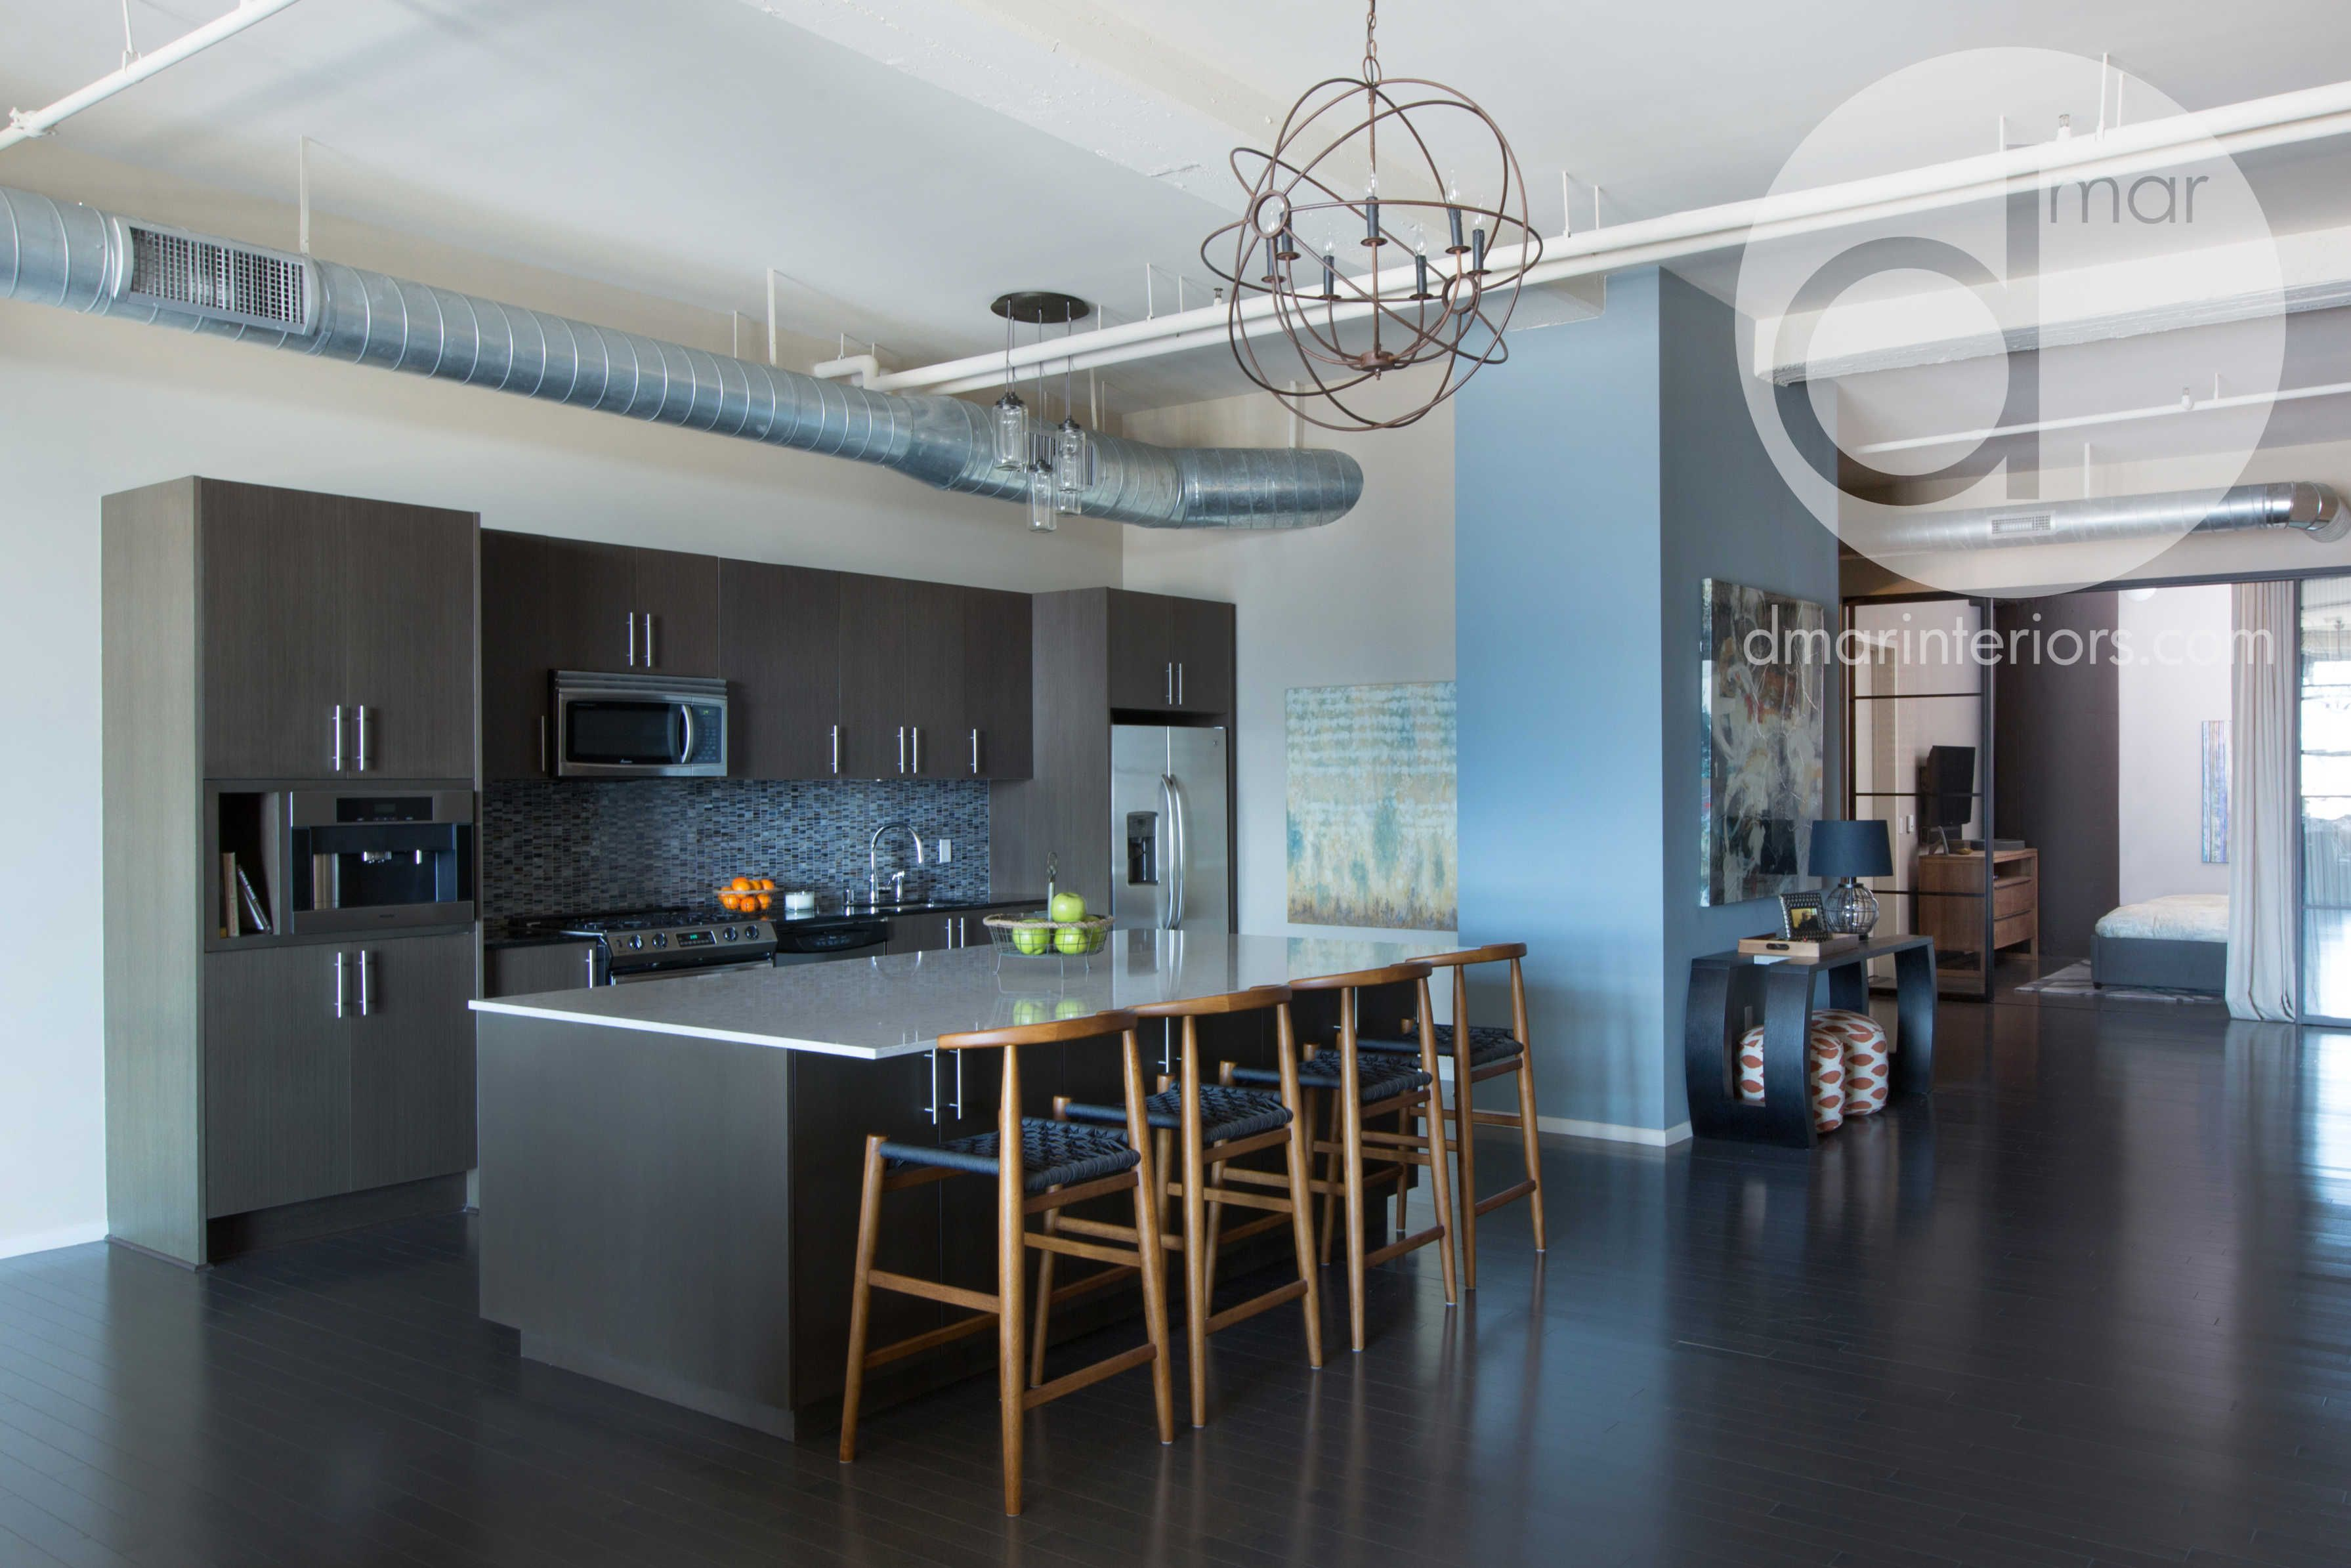 Custom Kitchen, Loft, Counter Stools, Large Island, Open Ceilings ...